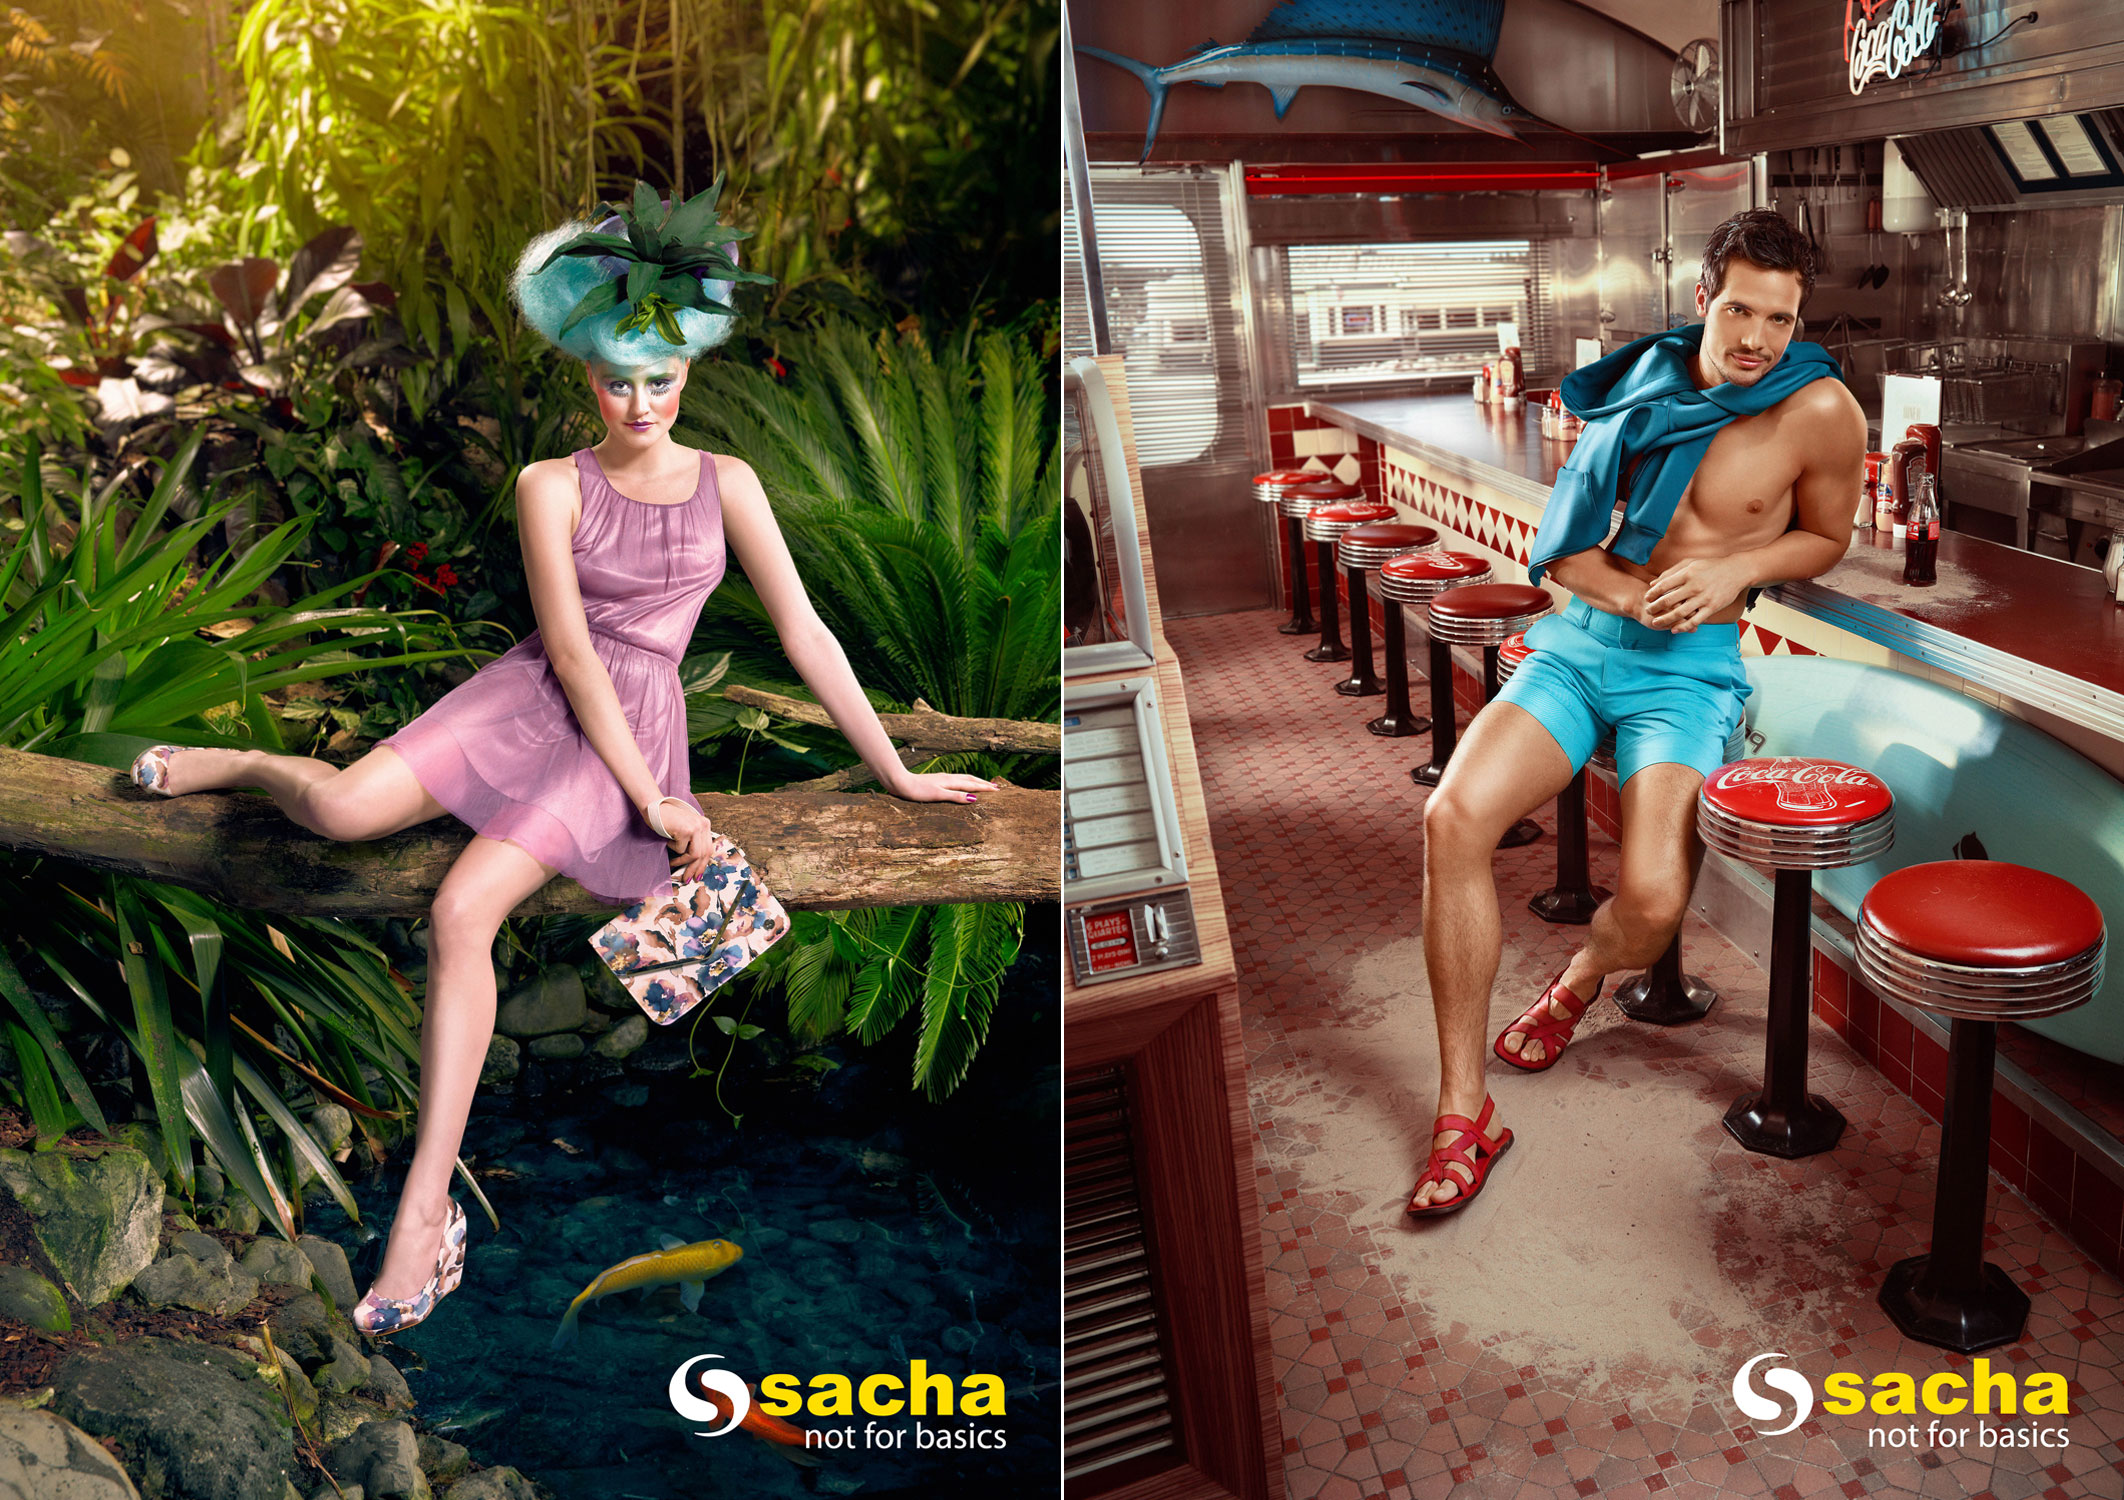 Sacha_Shoes_EnergyExplosion_WT2_Bruce.jpg-spread.jpg